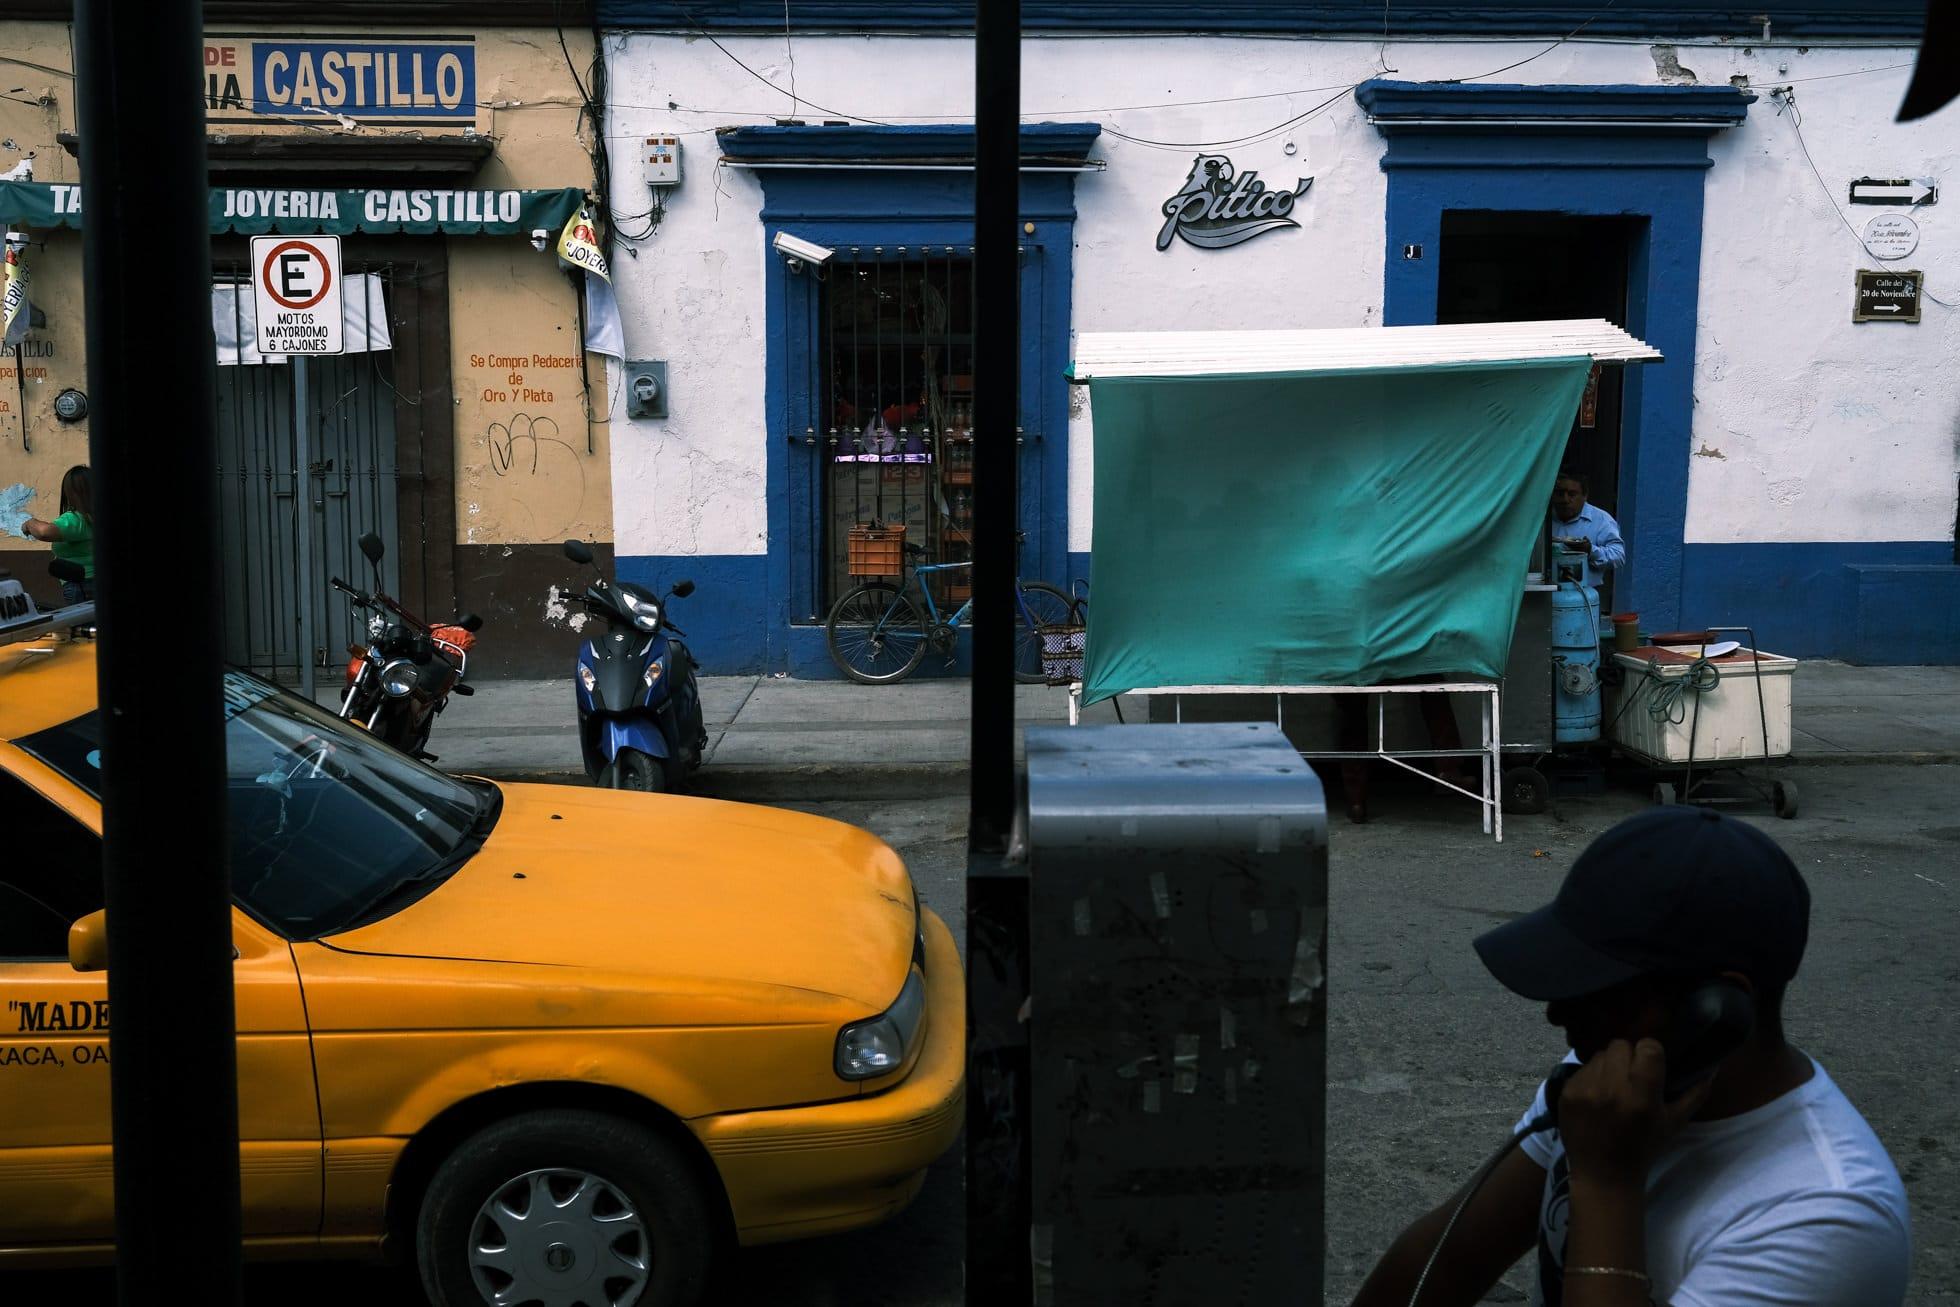 fujifilm-x-pro3-mexico-street-photography-46